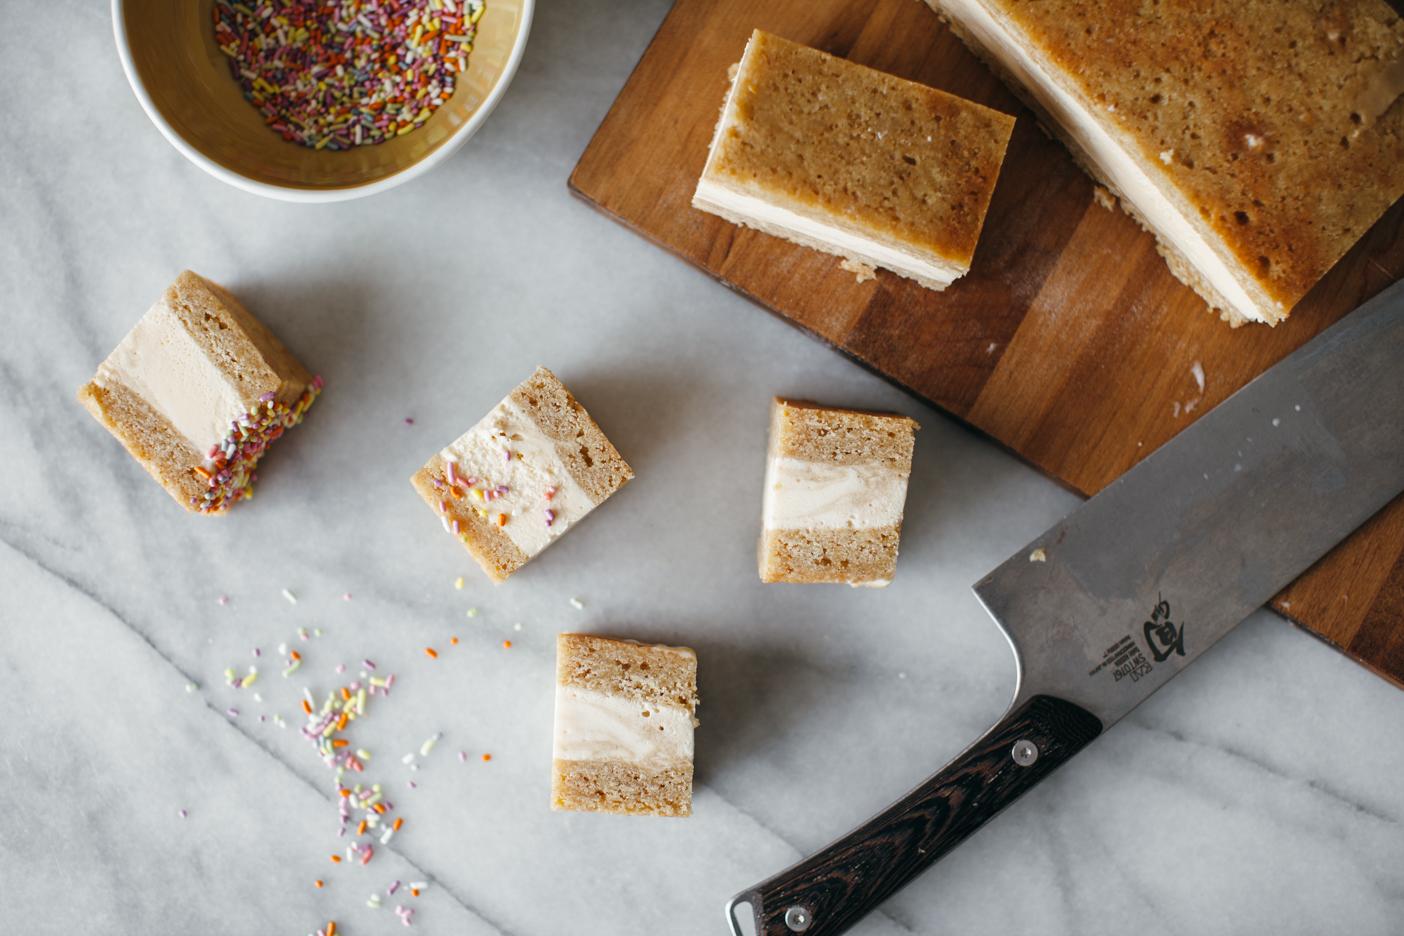 073580_ice-cream-sandwich-1.jpg